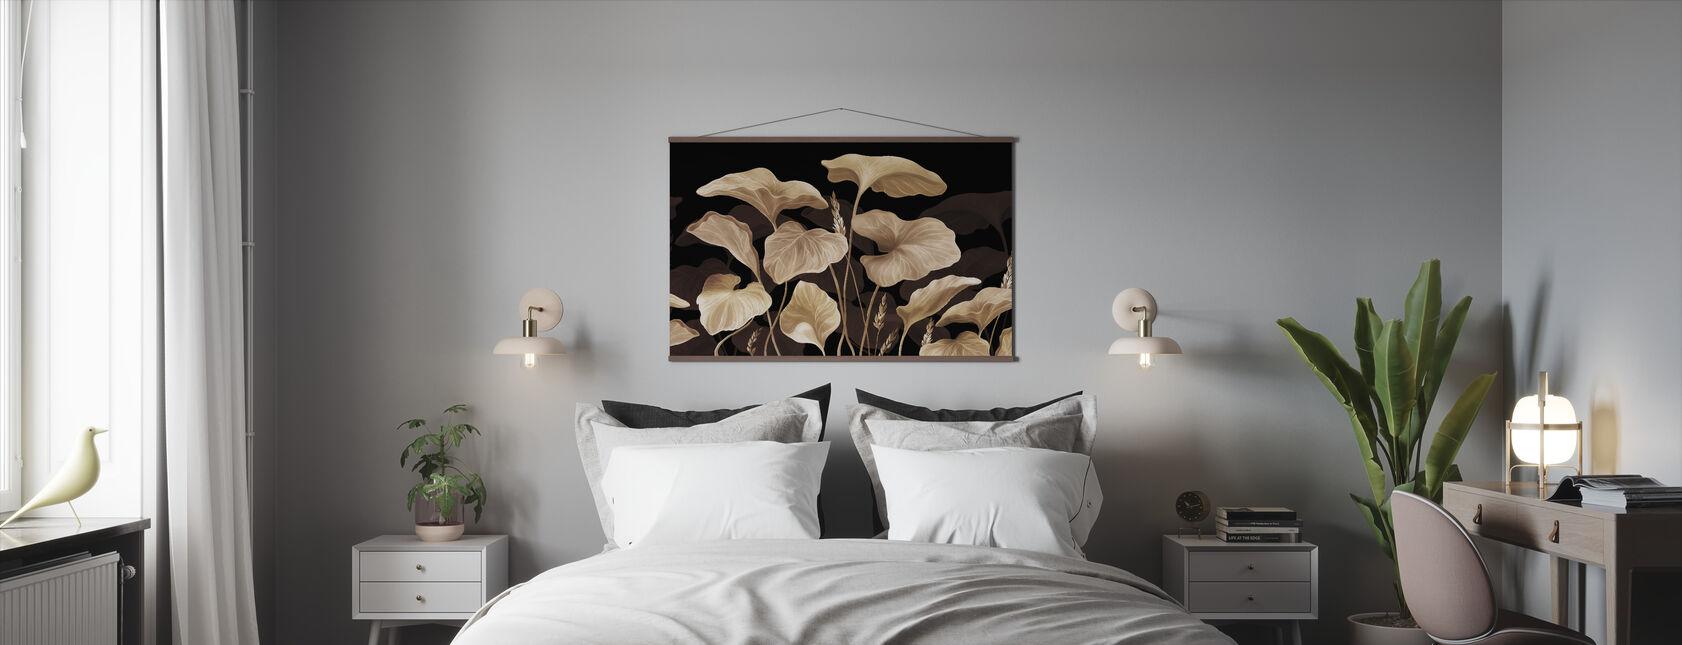 Lehdet - Pähkinäpensas - Juliste - Makuuhuone